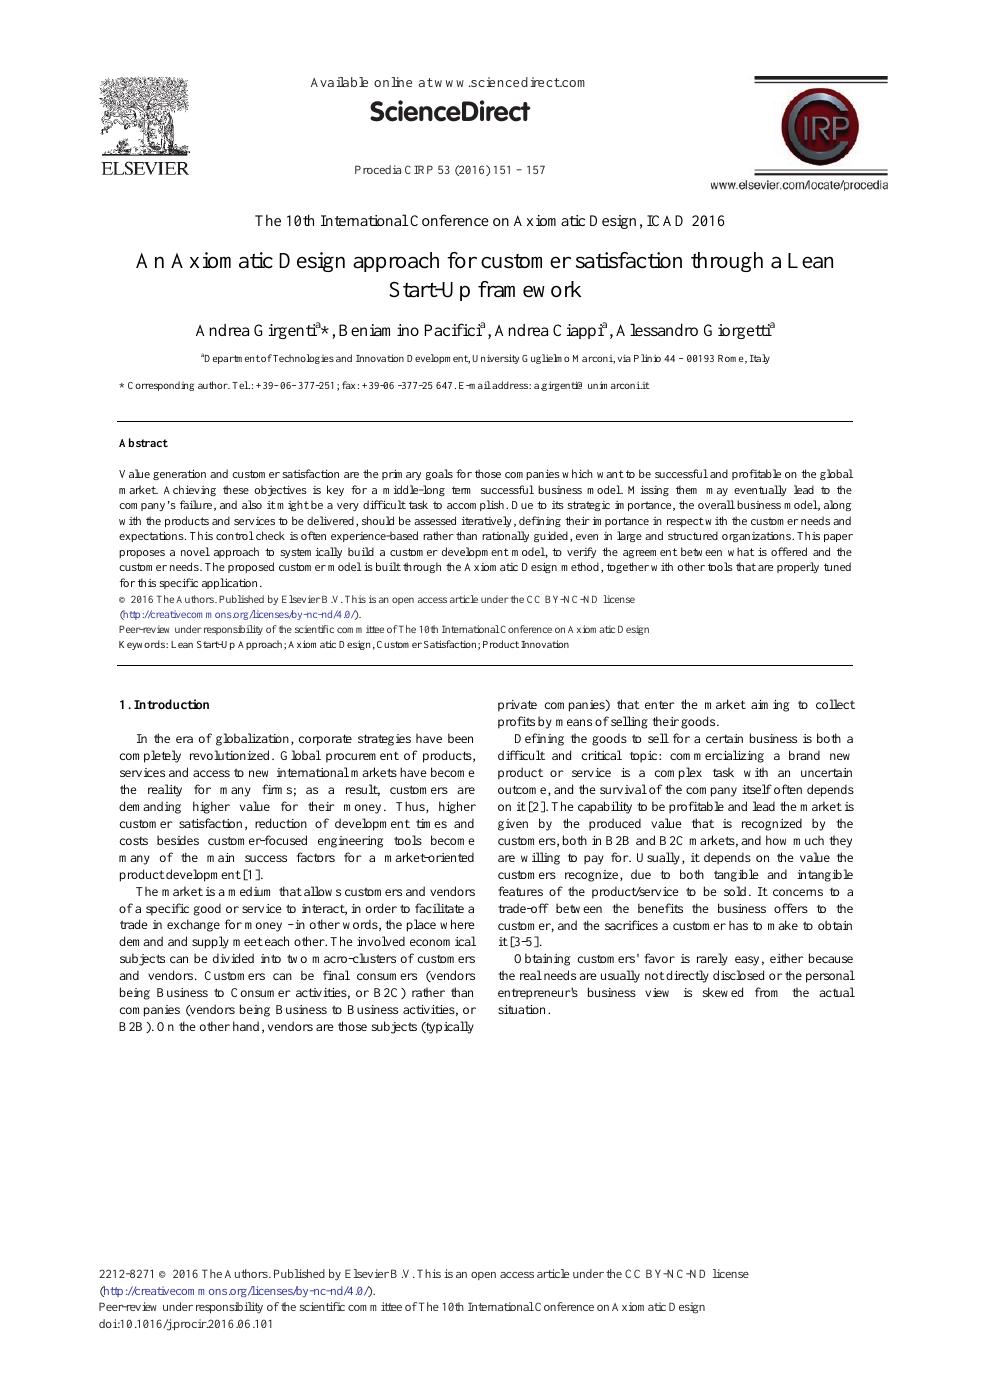 An Axiomatic Design Approach for Customer Satisfaction